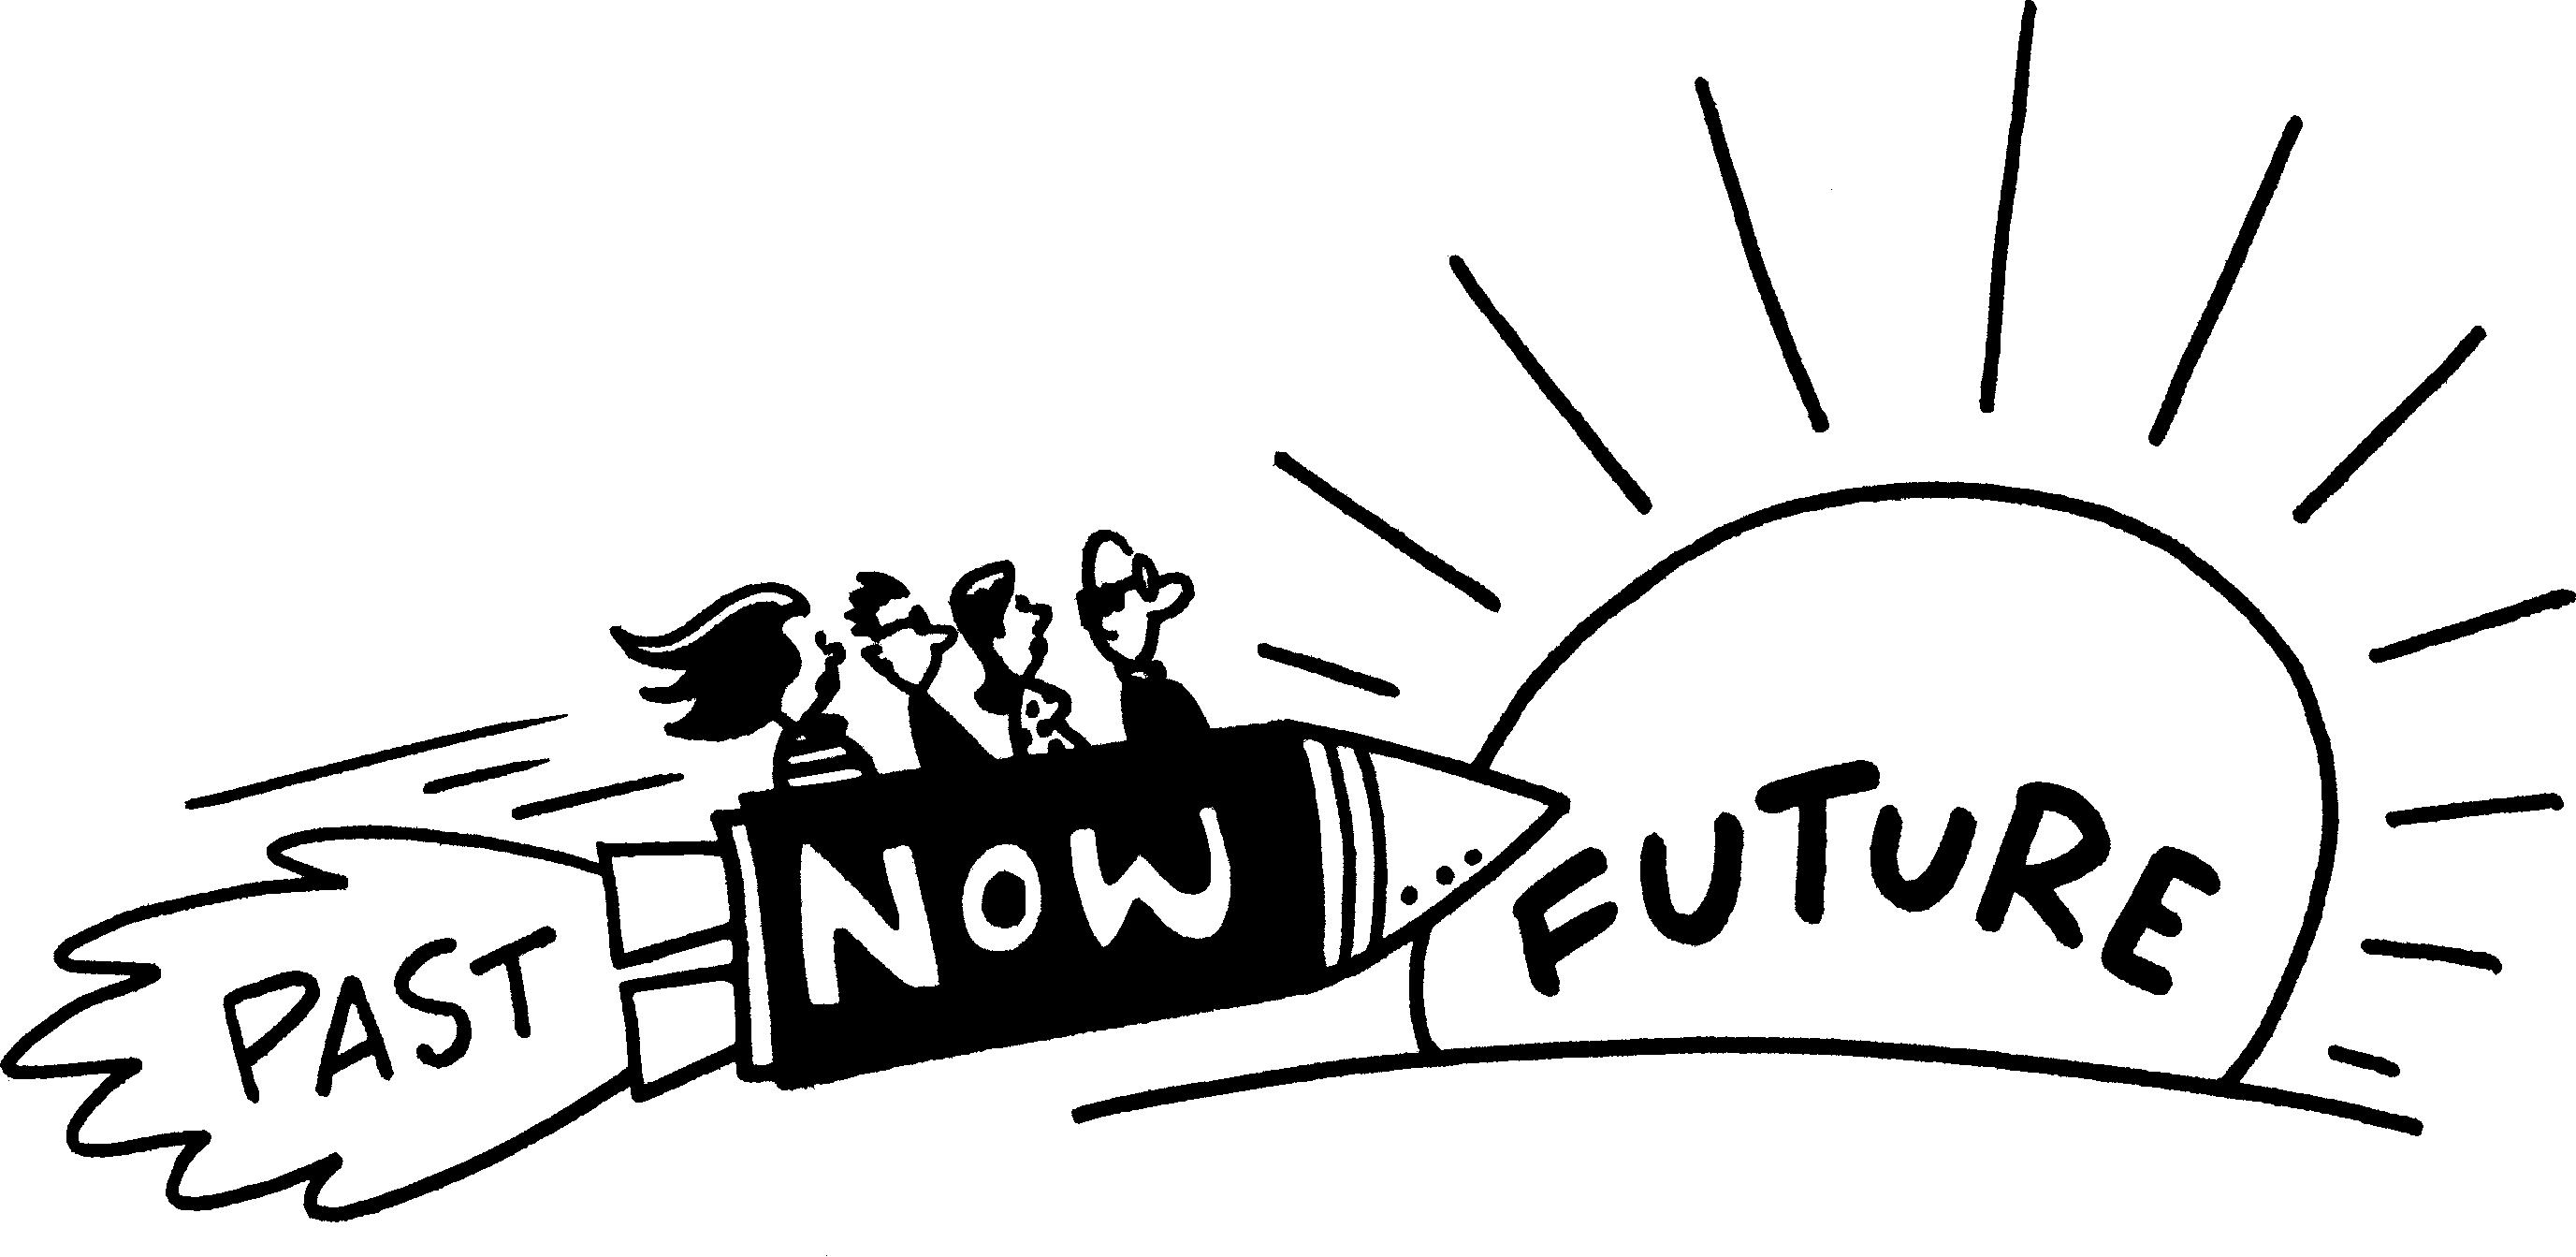 talking about future plans blog aston school